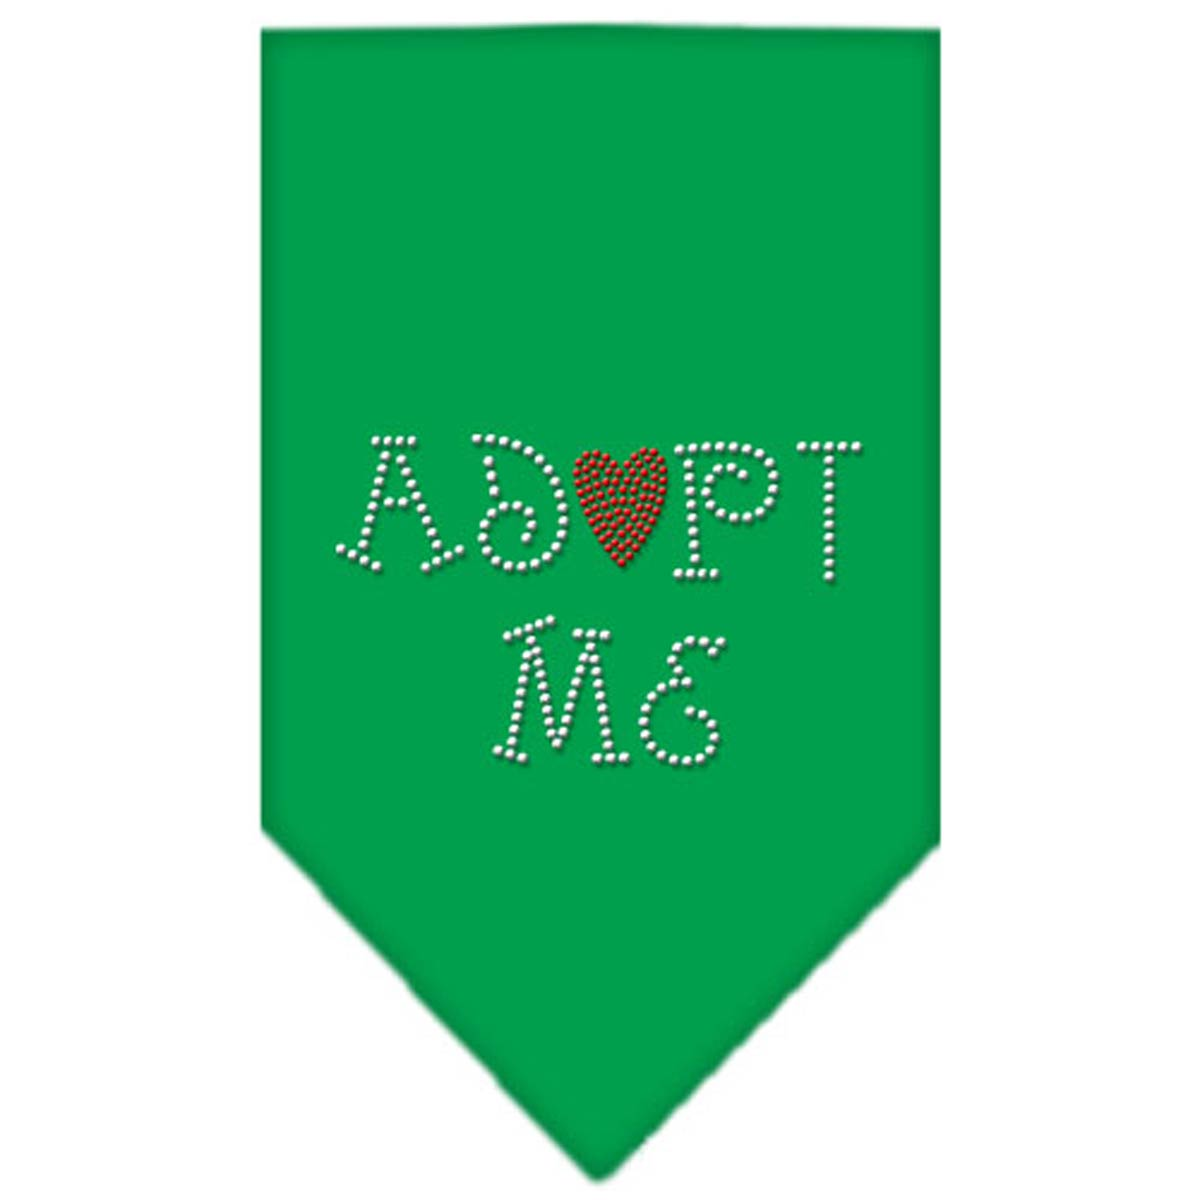 Adopt Me Dog Bandana - Green